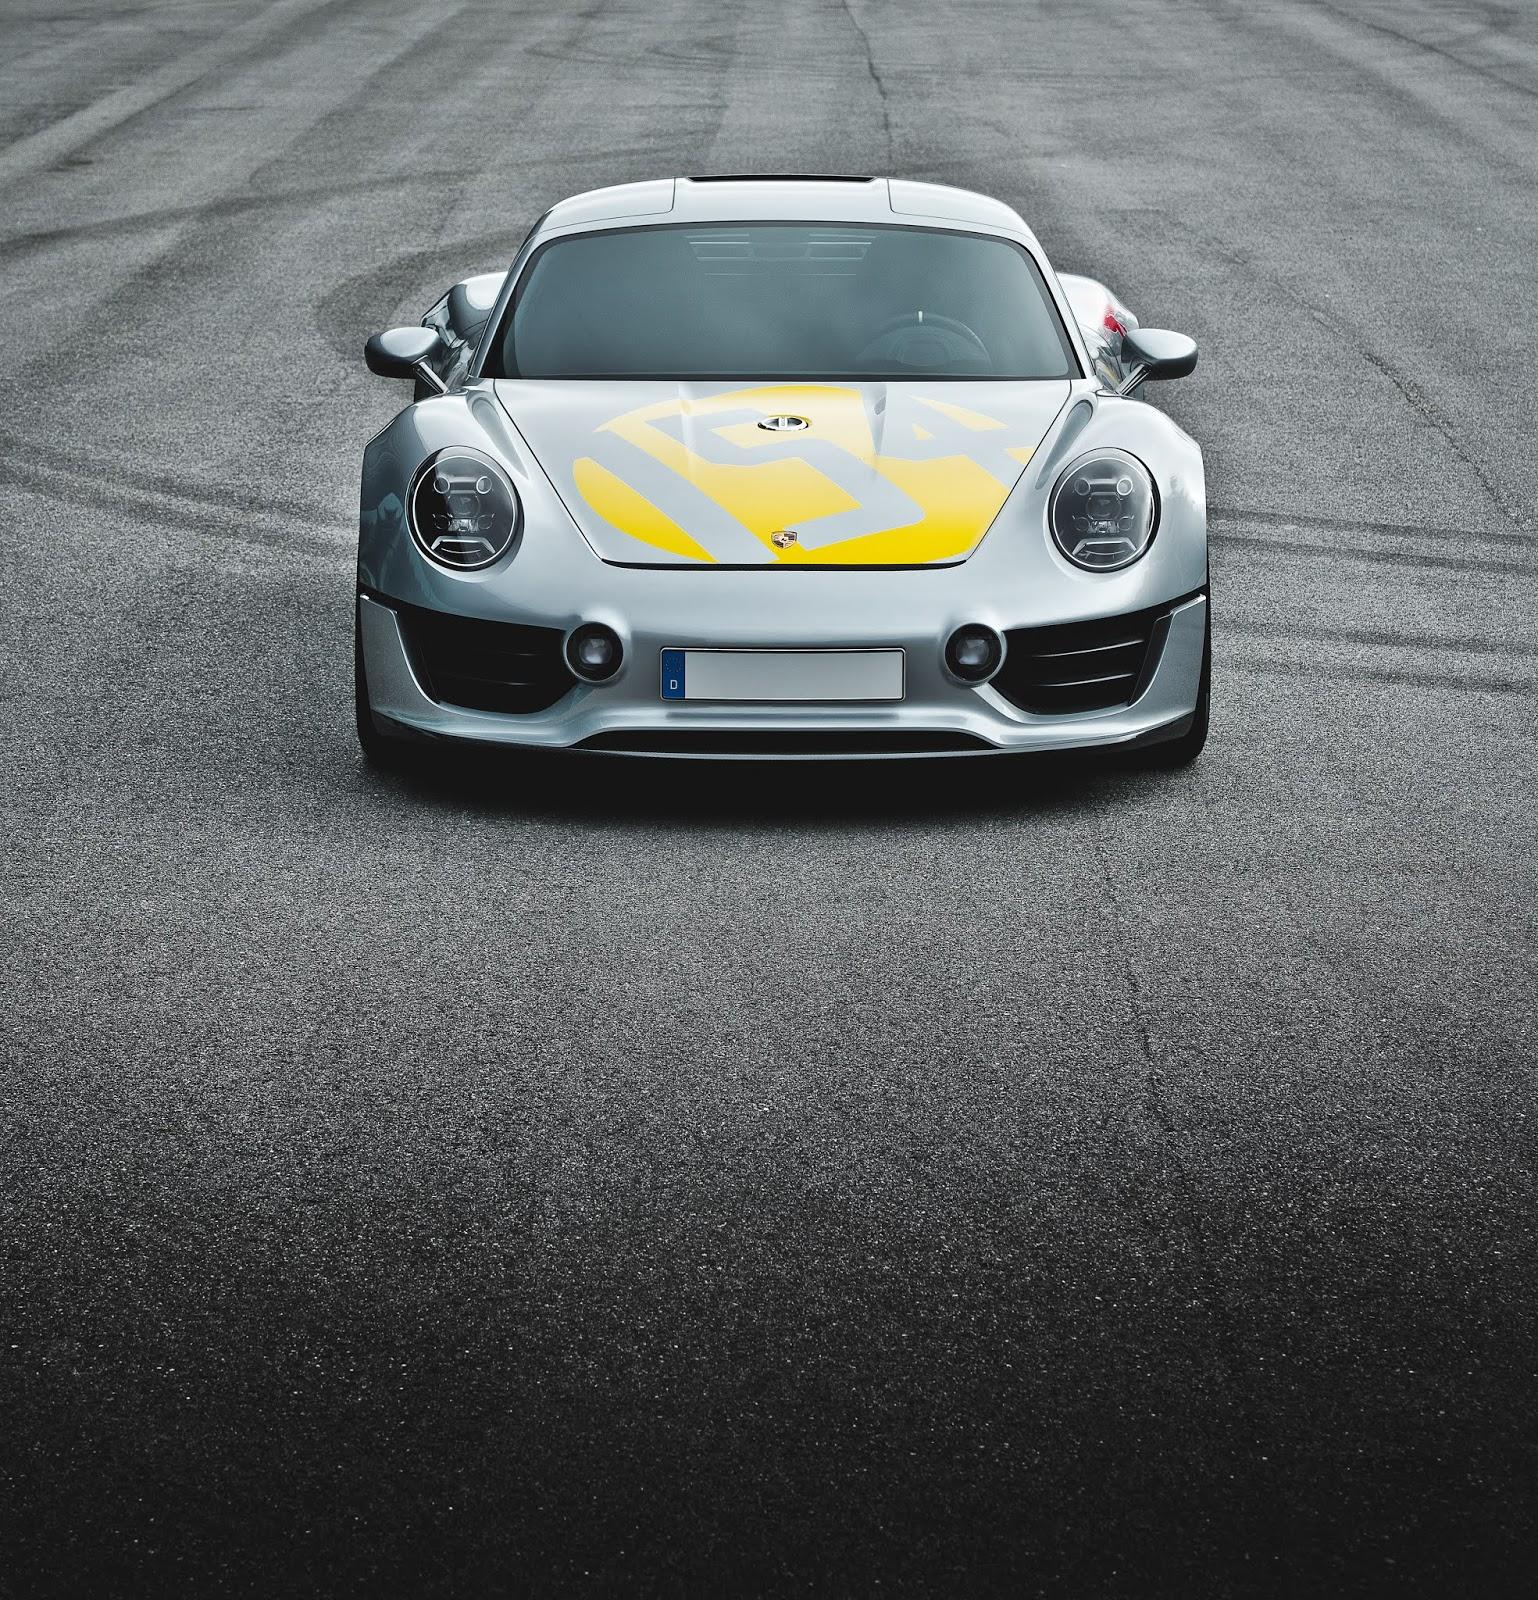 CVS0656 Le Mans Living Legend : Το πρωτότυπο που γέννησε την 718 Cayman GT4 LE MANS, Porsche, Porsche Le Mans, Porsche Unseen, sportscar, supercar, supercars, zblog, ειδήσεις